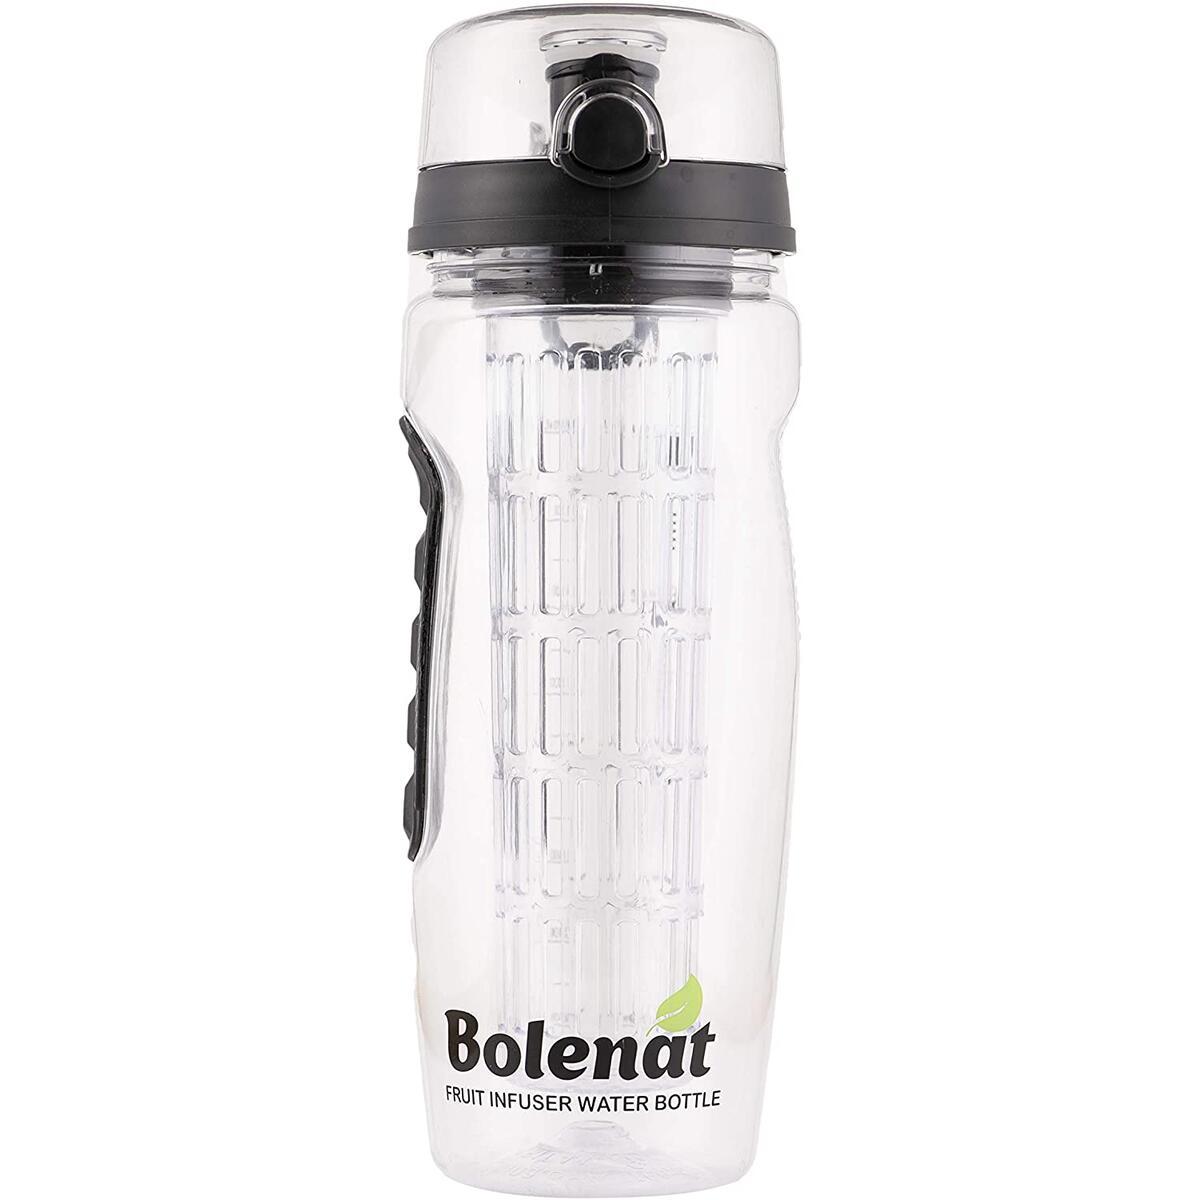 Bolenat Daily Pro Aqua Fruit Infuser Water Bottle, 32 oz Large. Reusable safe for Women & Men, portable Healthy Set- leak Protection, Shaker ball for Protein Shakes, Tritan Bpa Free (black)